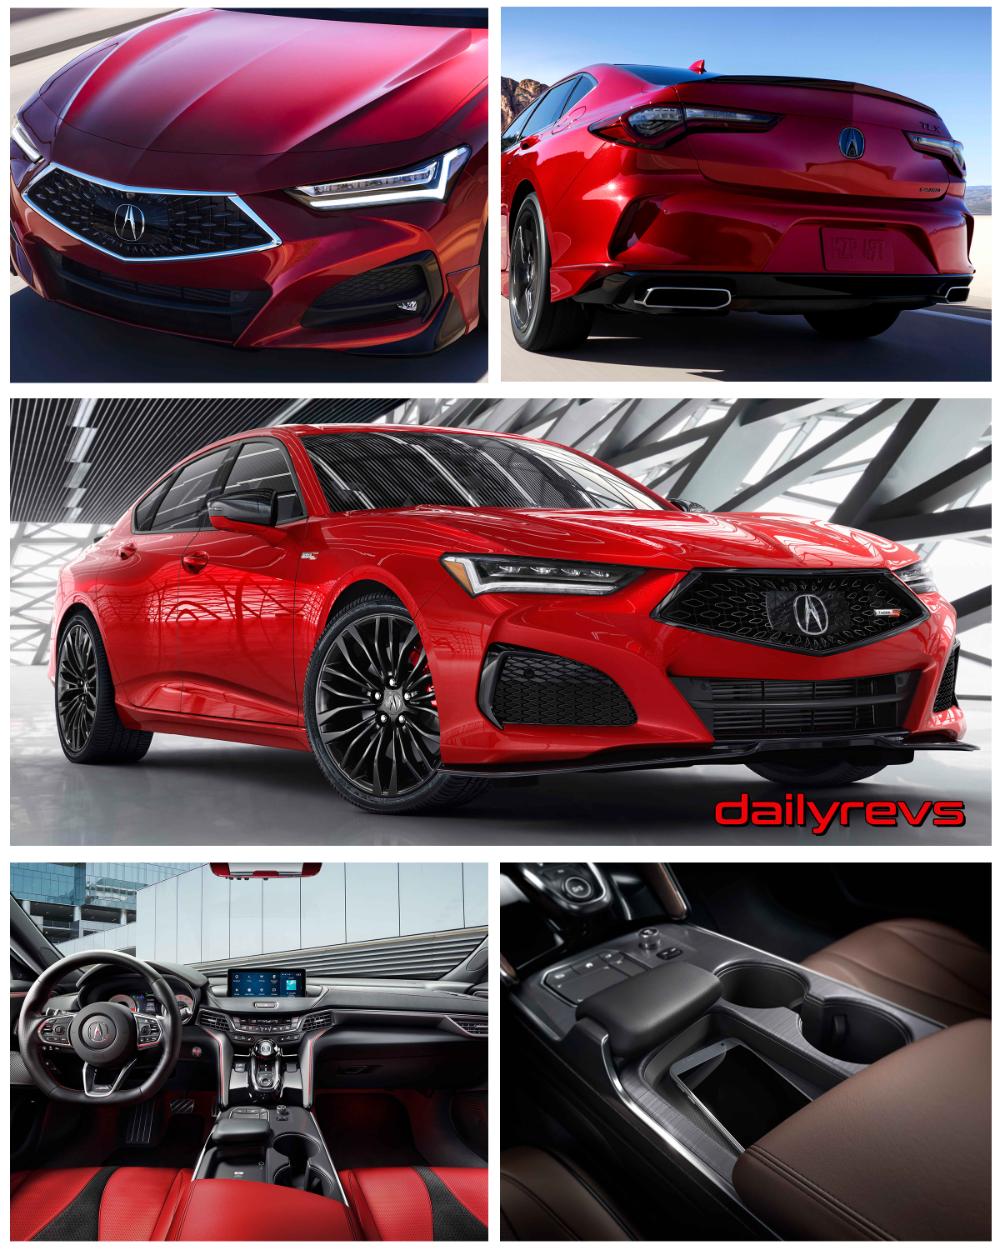 2021 Acura TLX in 2020 Acura tlx, Acura